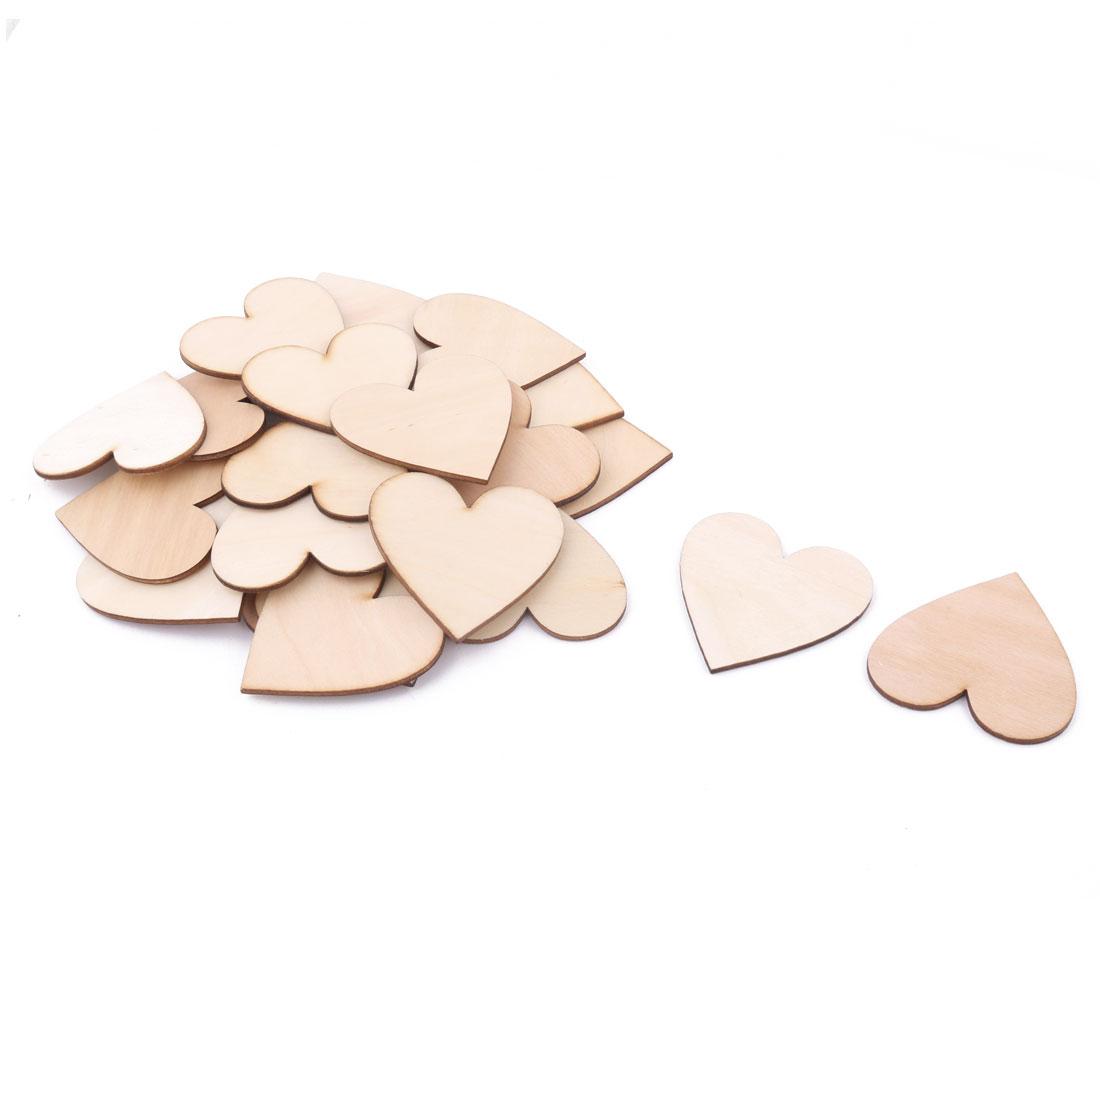 Wooden Love Heart Shaped Wedding Decor Art Craft DIY Accessories Embellishment Beige 60 x 55mm 25 Pcs